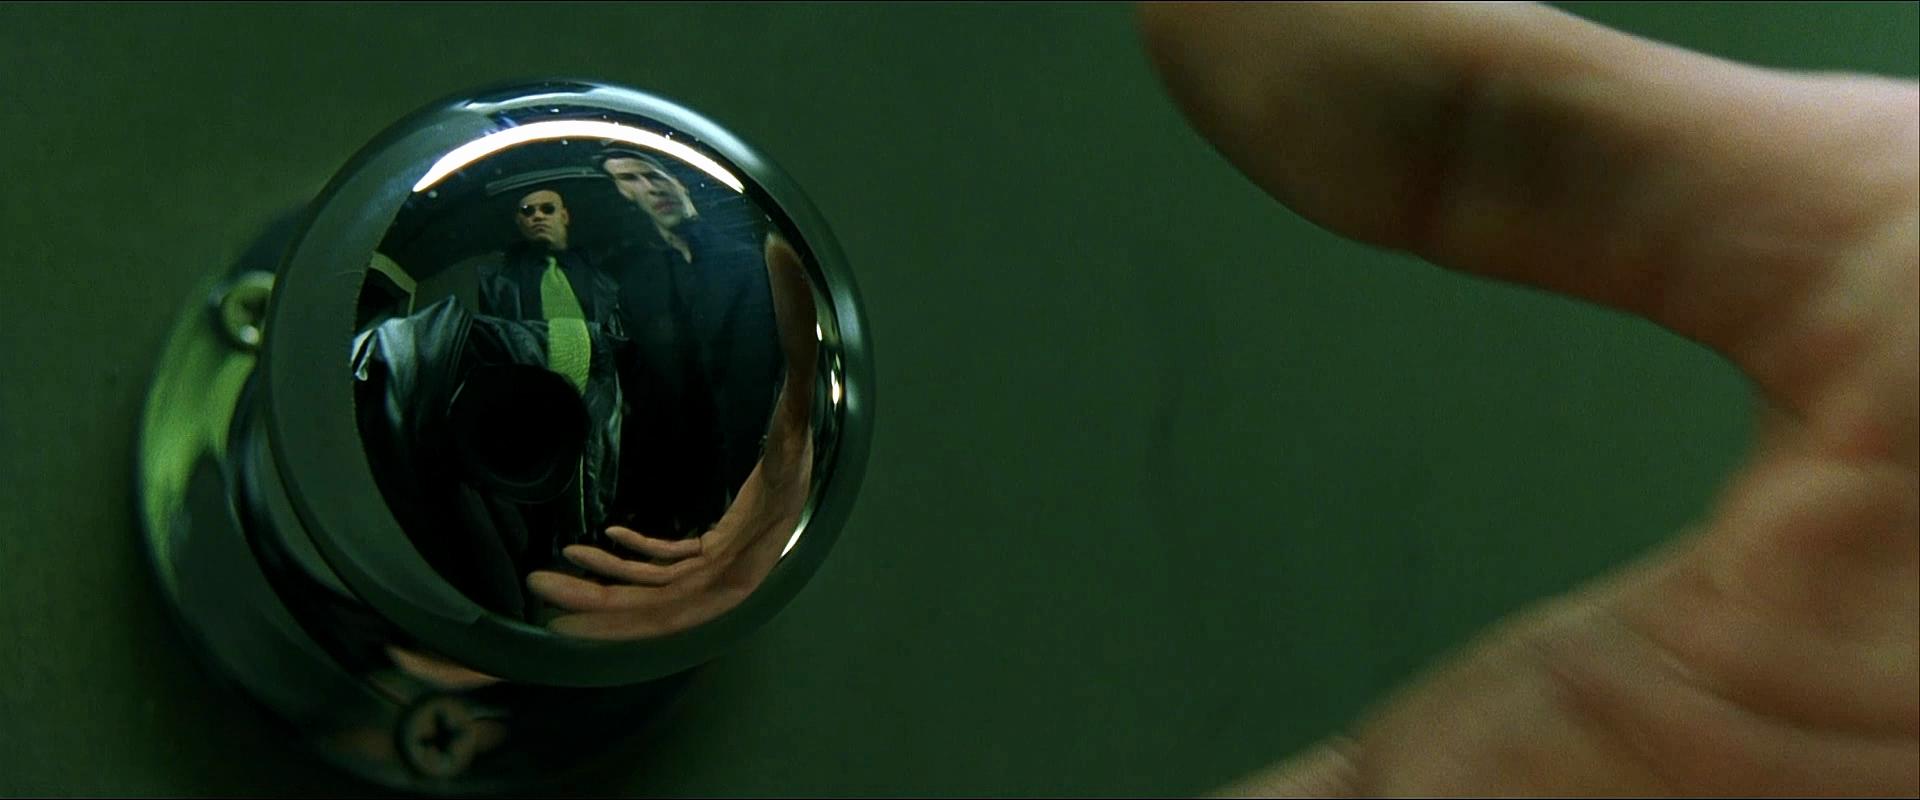 7. The Matrix